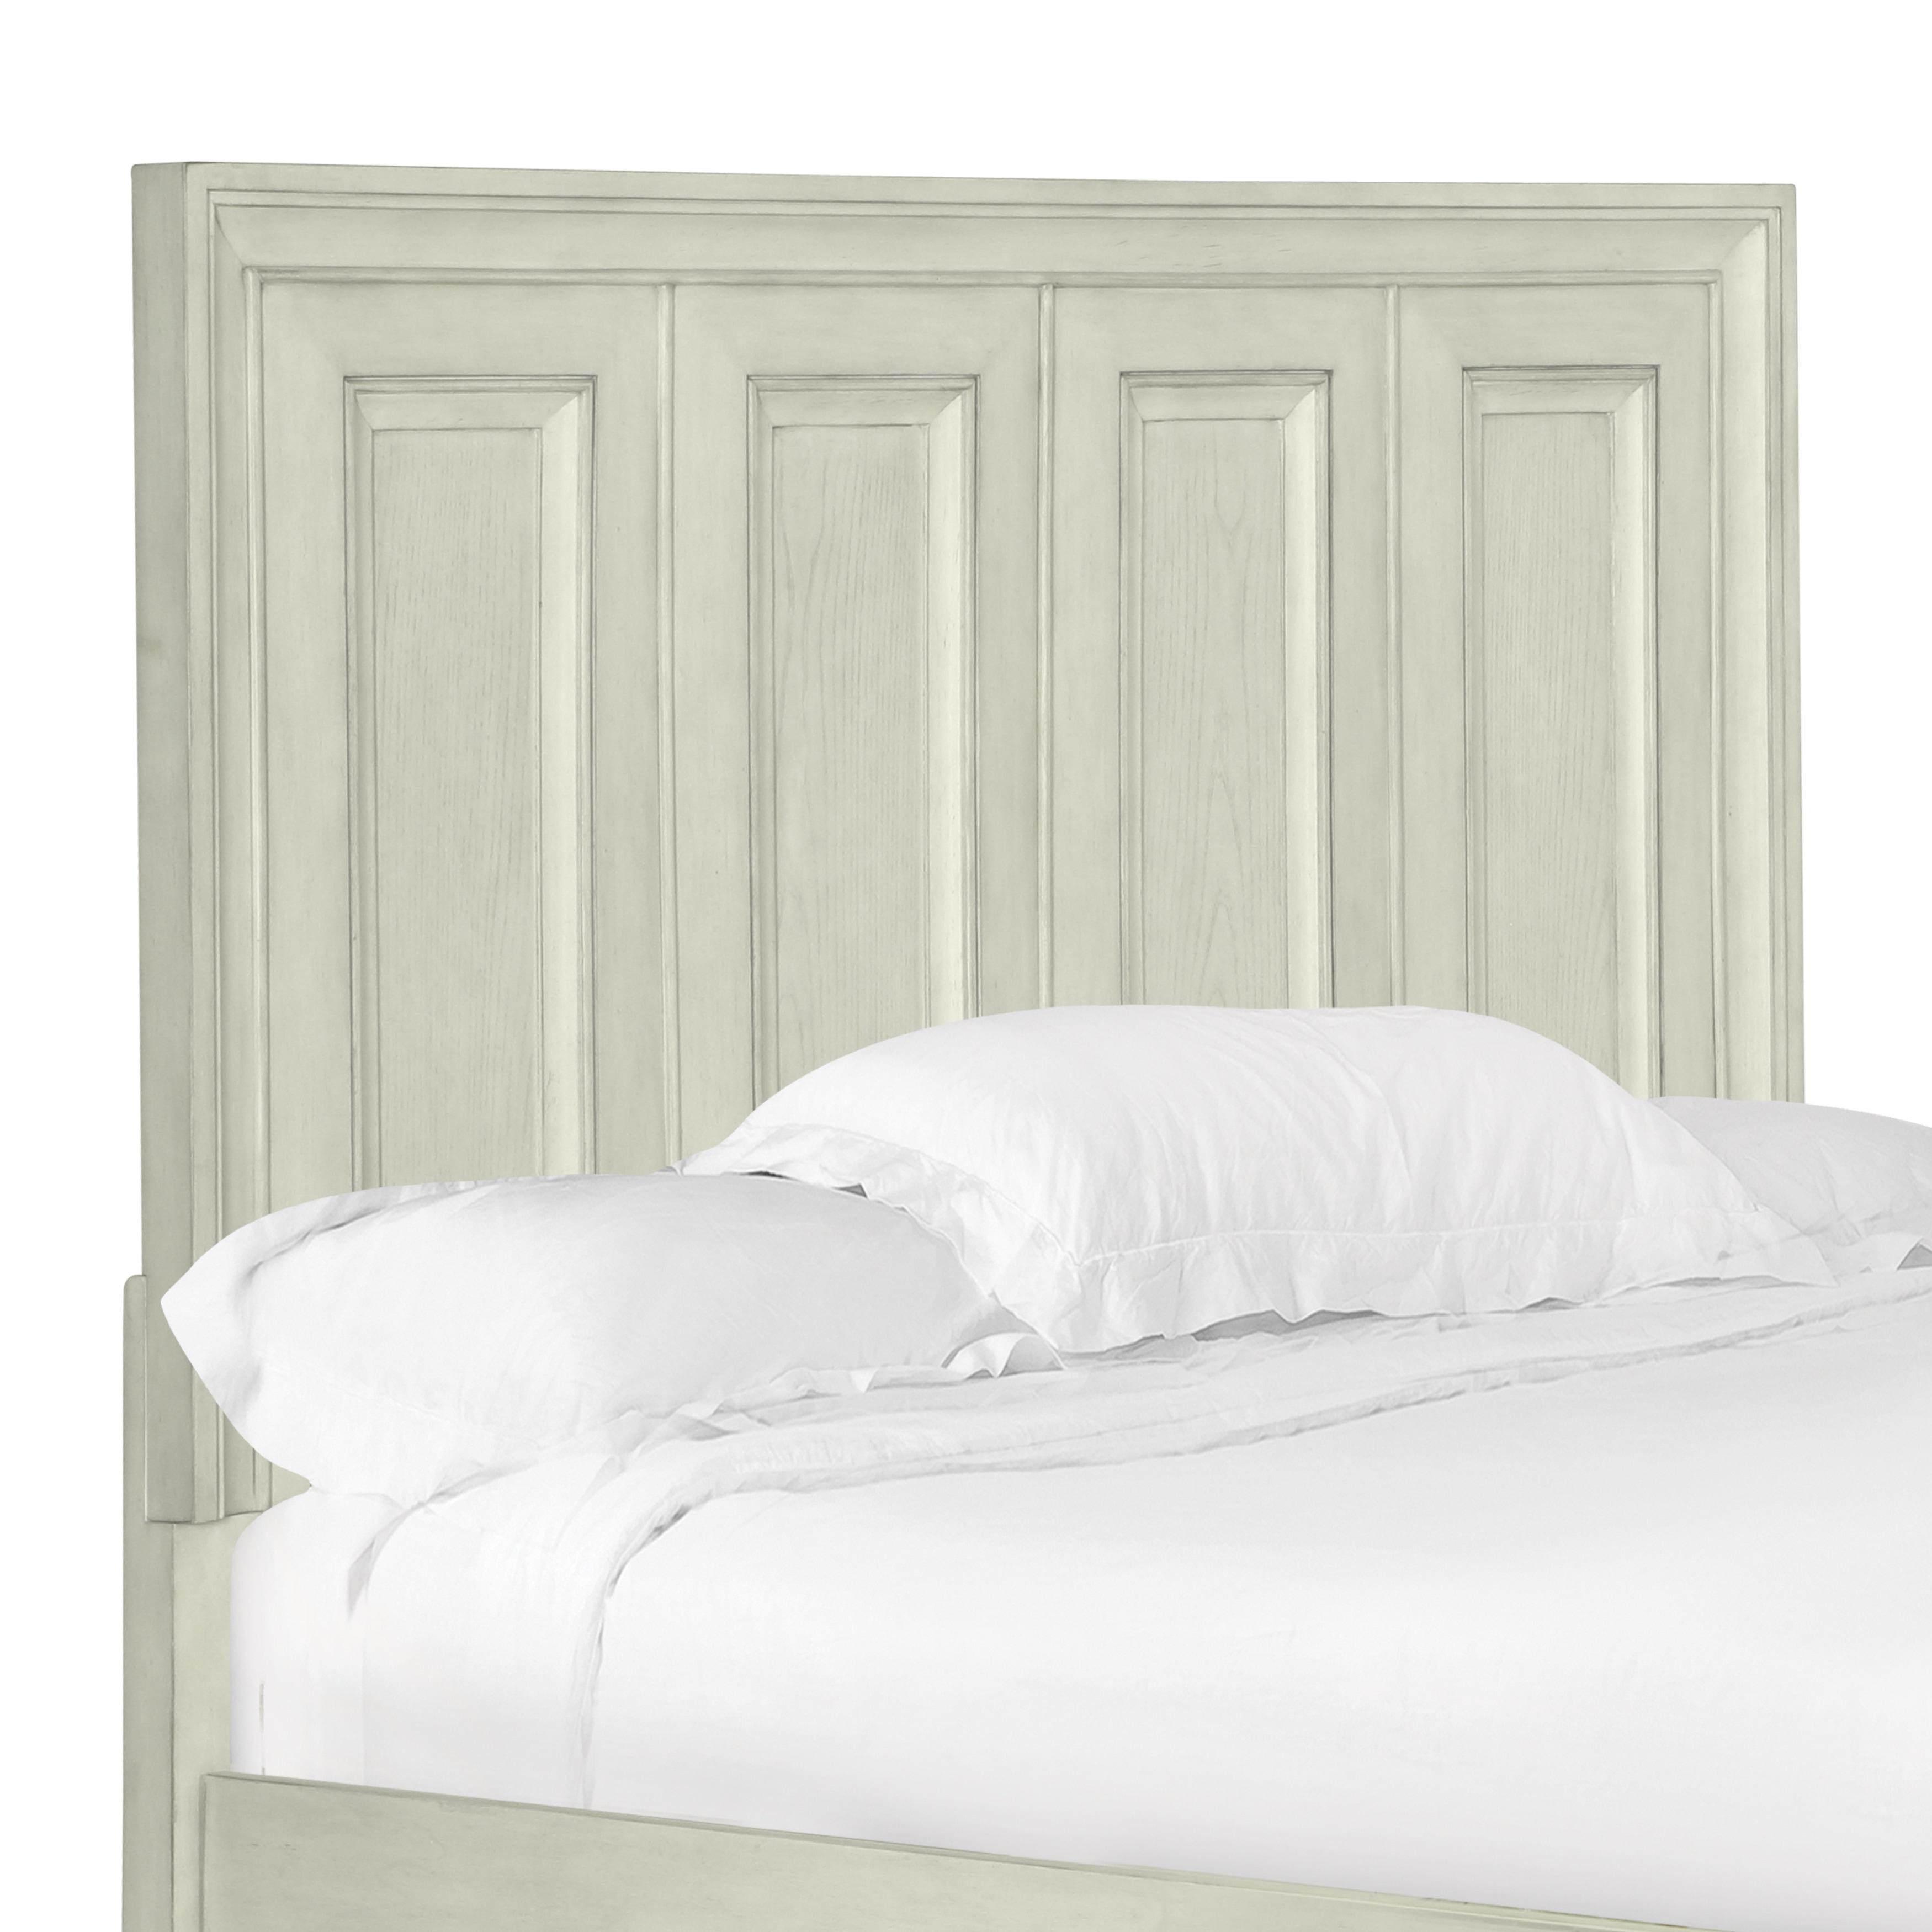 Magnussen Home Furnishings Raelynn Panel Bed Queen Headbo...